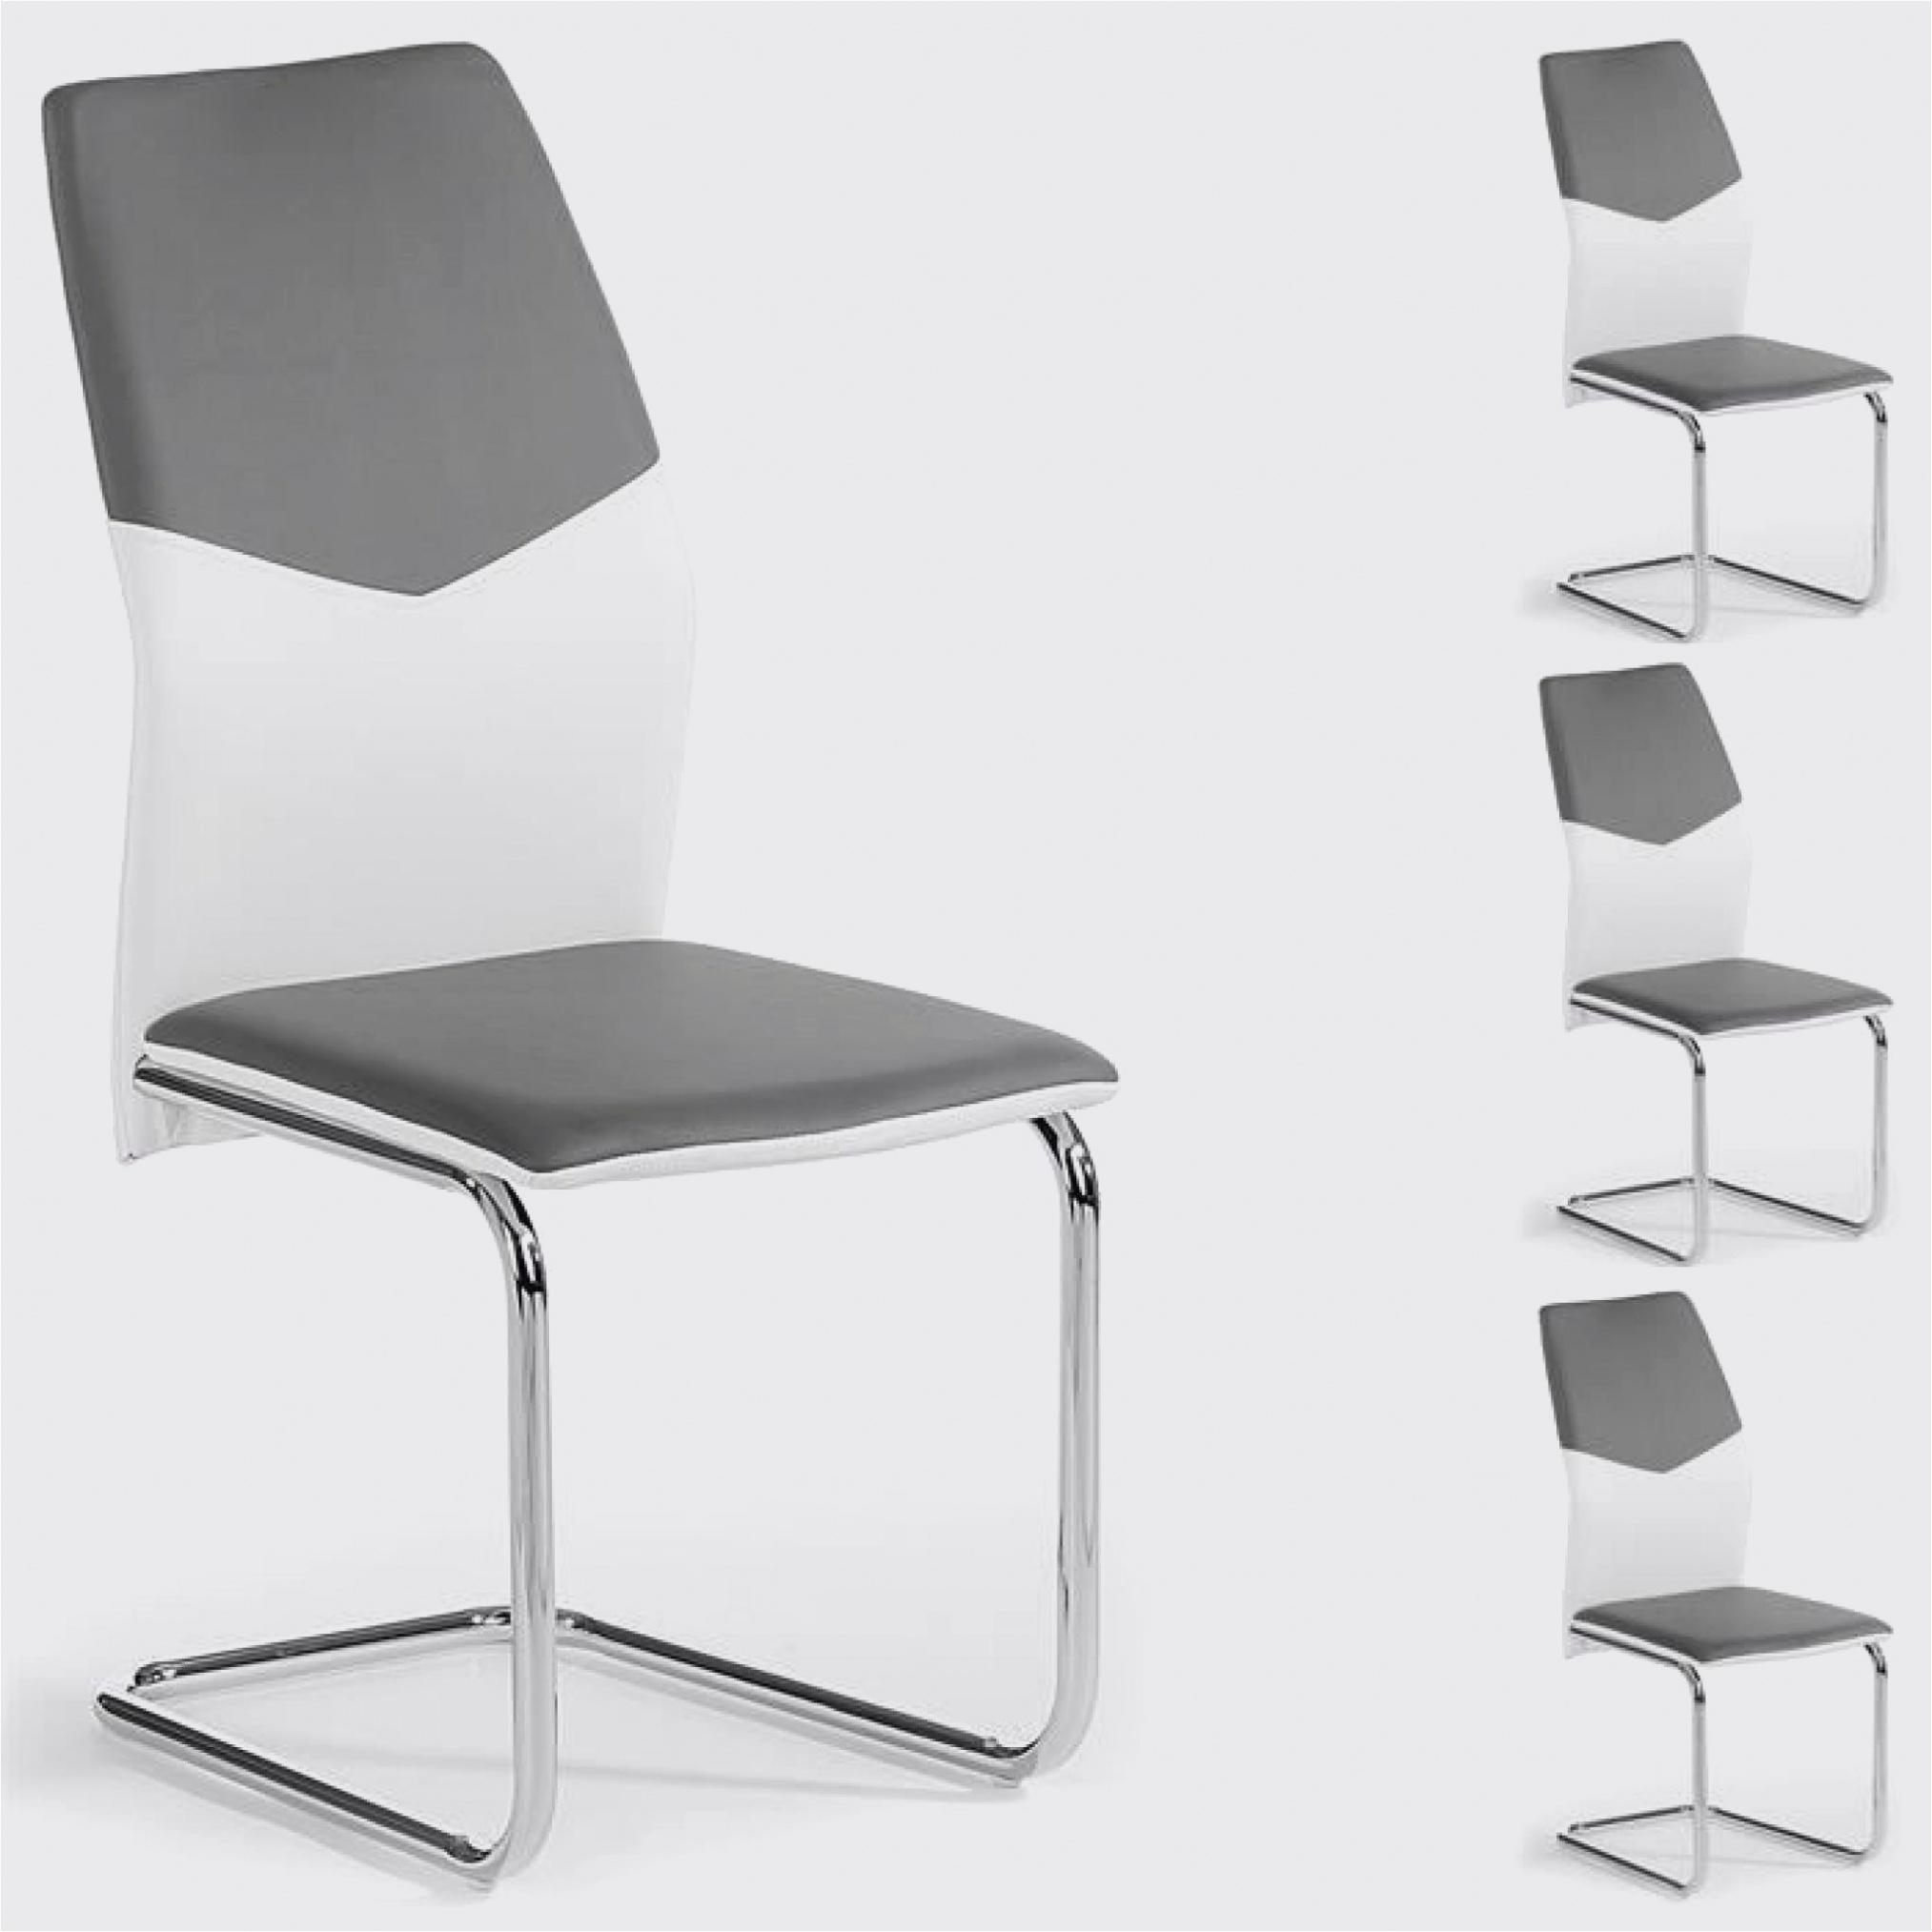 Table Kettler solde Impressionnant Image Maha De Table Pliante Metal Mahagranda De Home